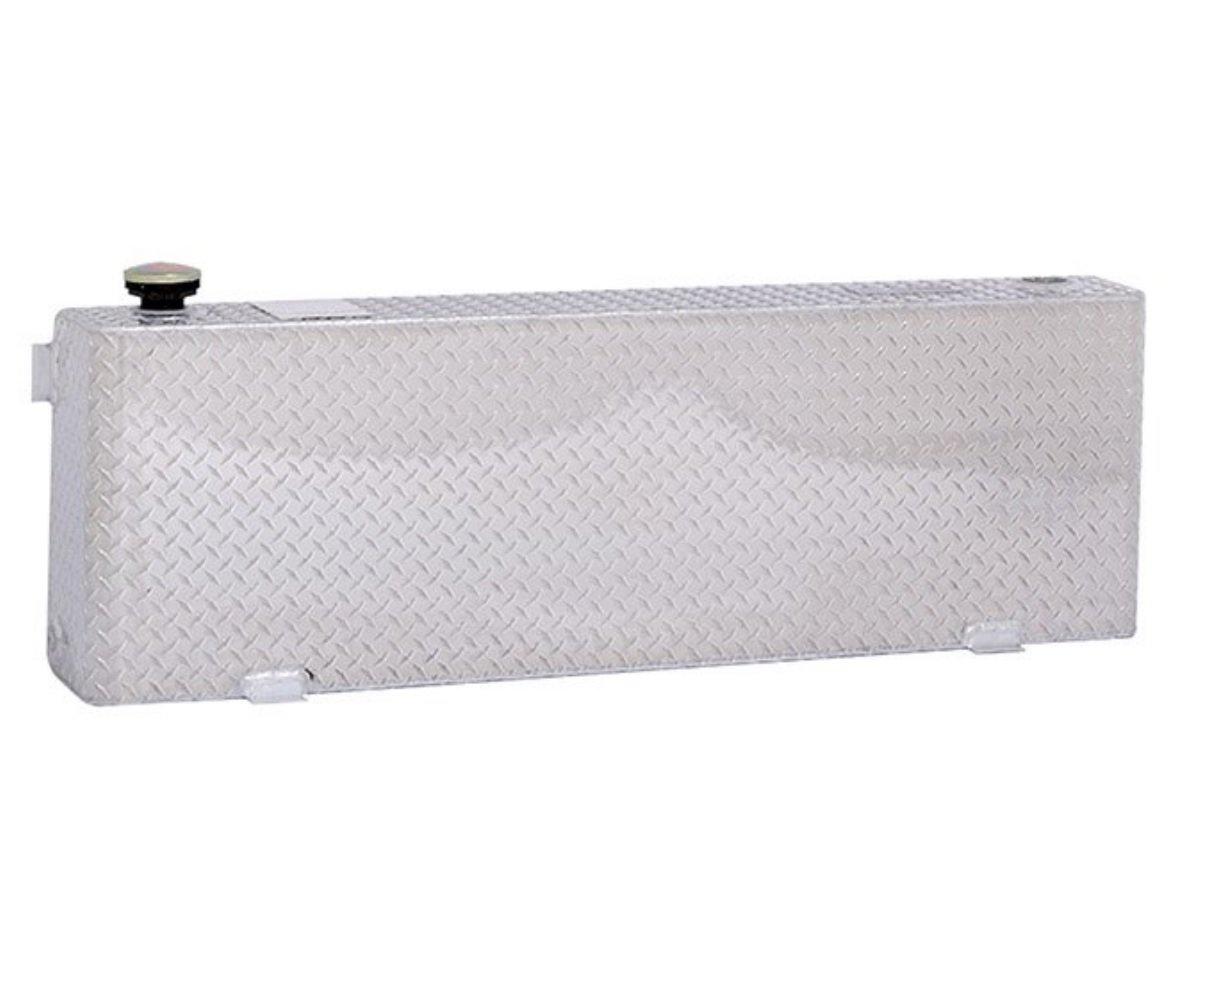 Dee Zee DZ92556N Liquid Transfer Tank Volume 40 Gallons L 56 in. x W 9.625 in. x H 19 in. Narrow Rectangle Shape Brite-Tread Aluminum Liquid Transfer Tank